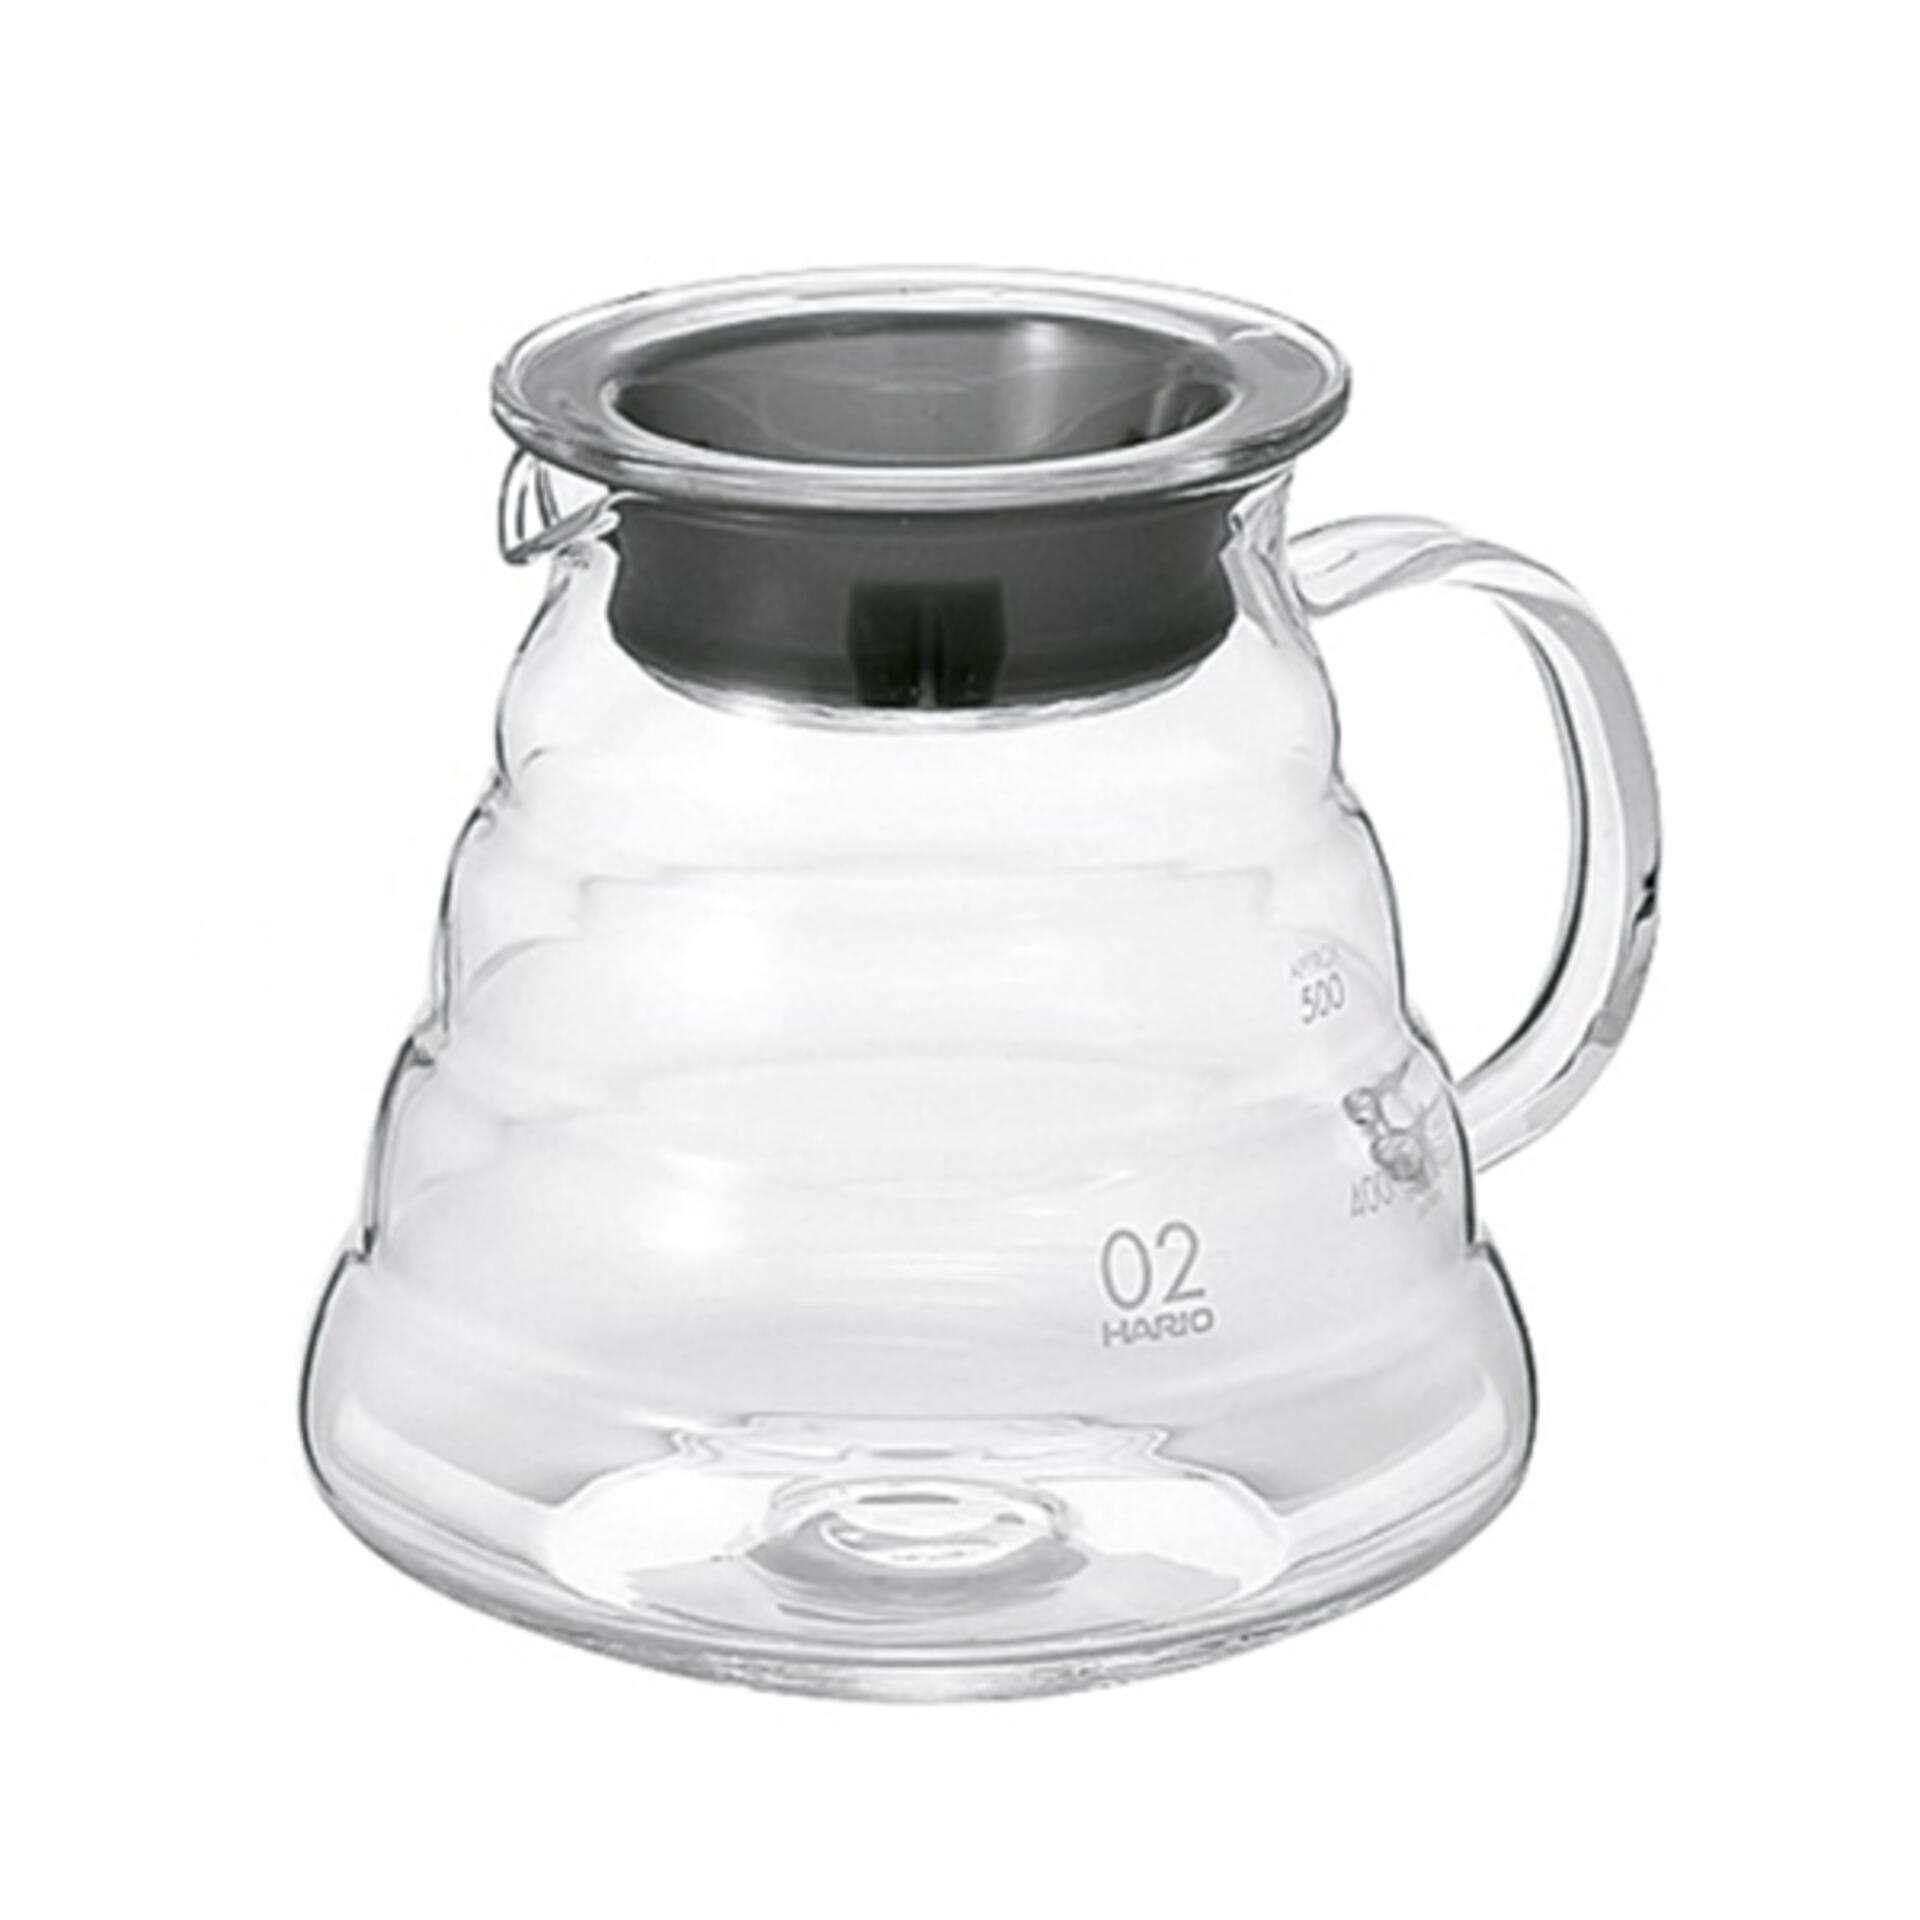 Hario Kaffeekanne V60 Glas 600 ml